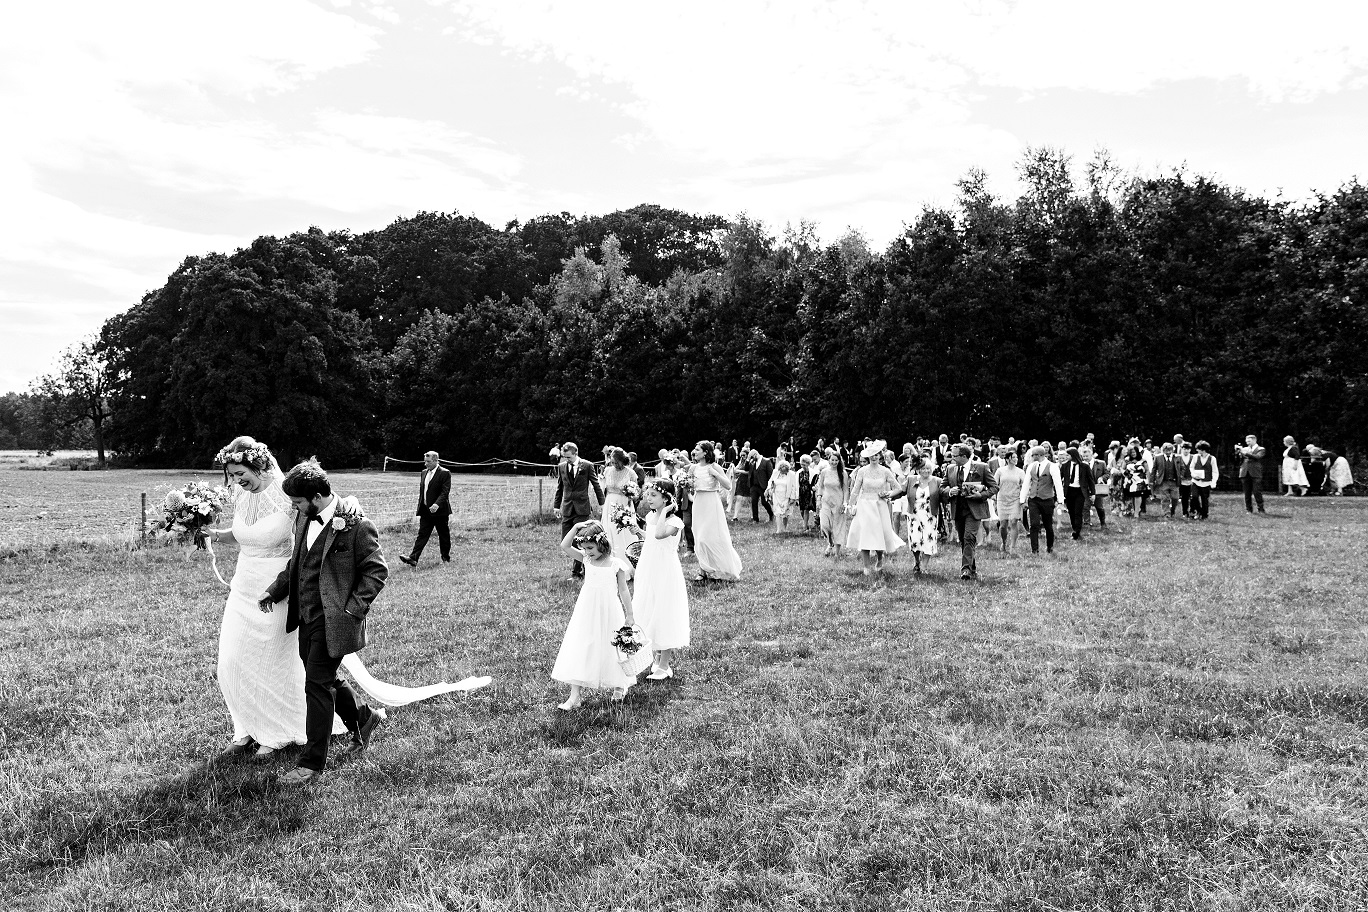 Escrick Park Outdoor Wedding in York